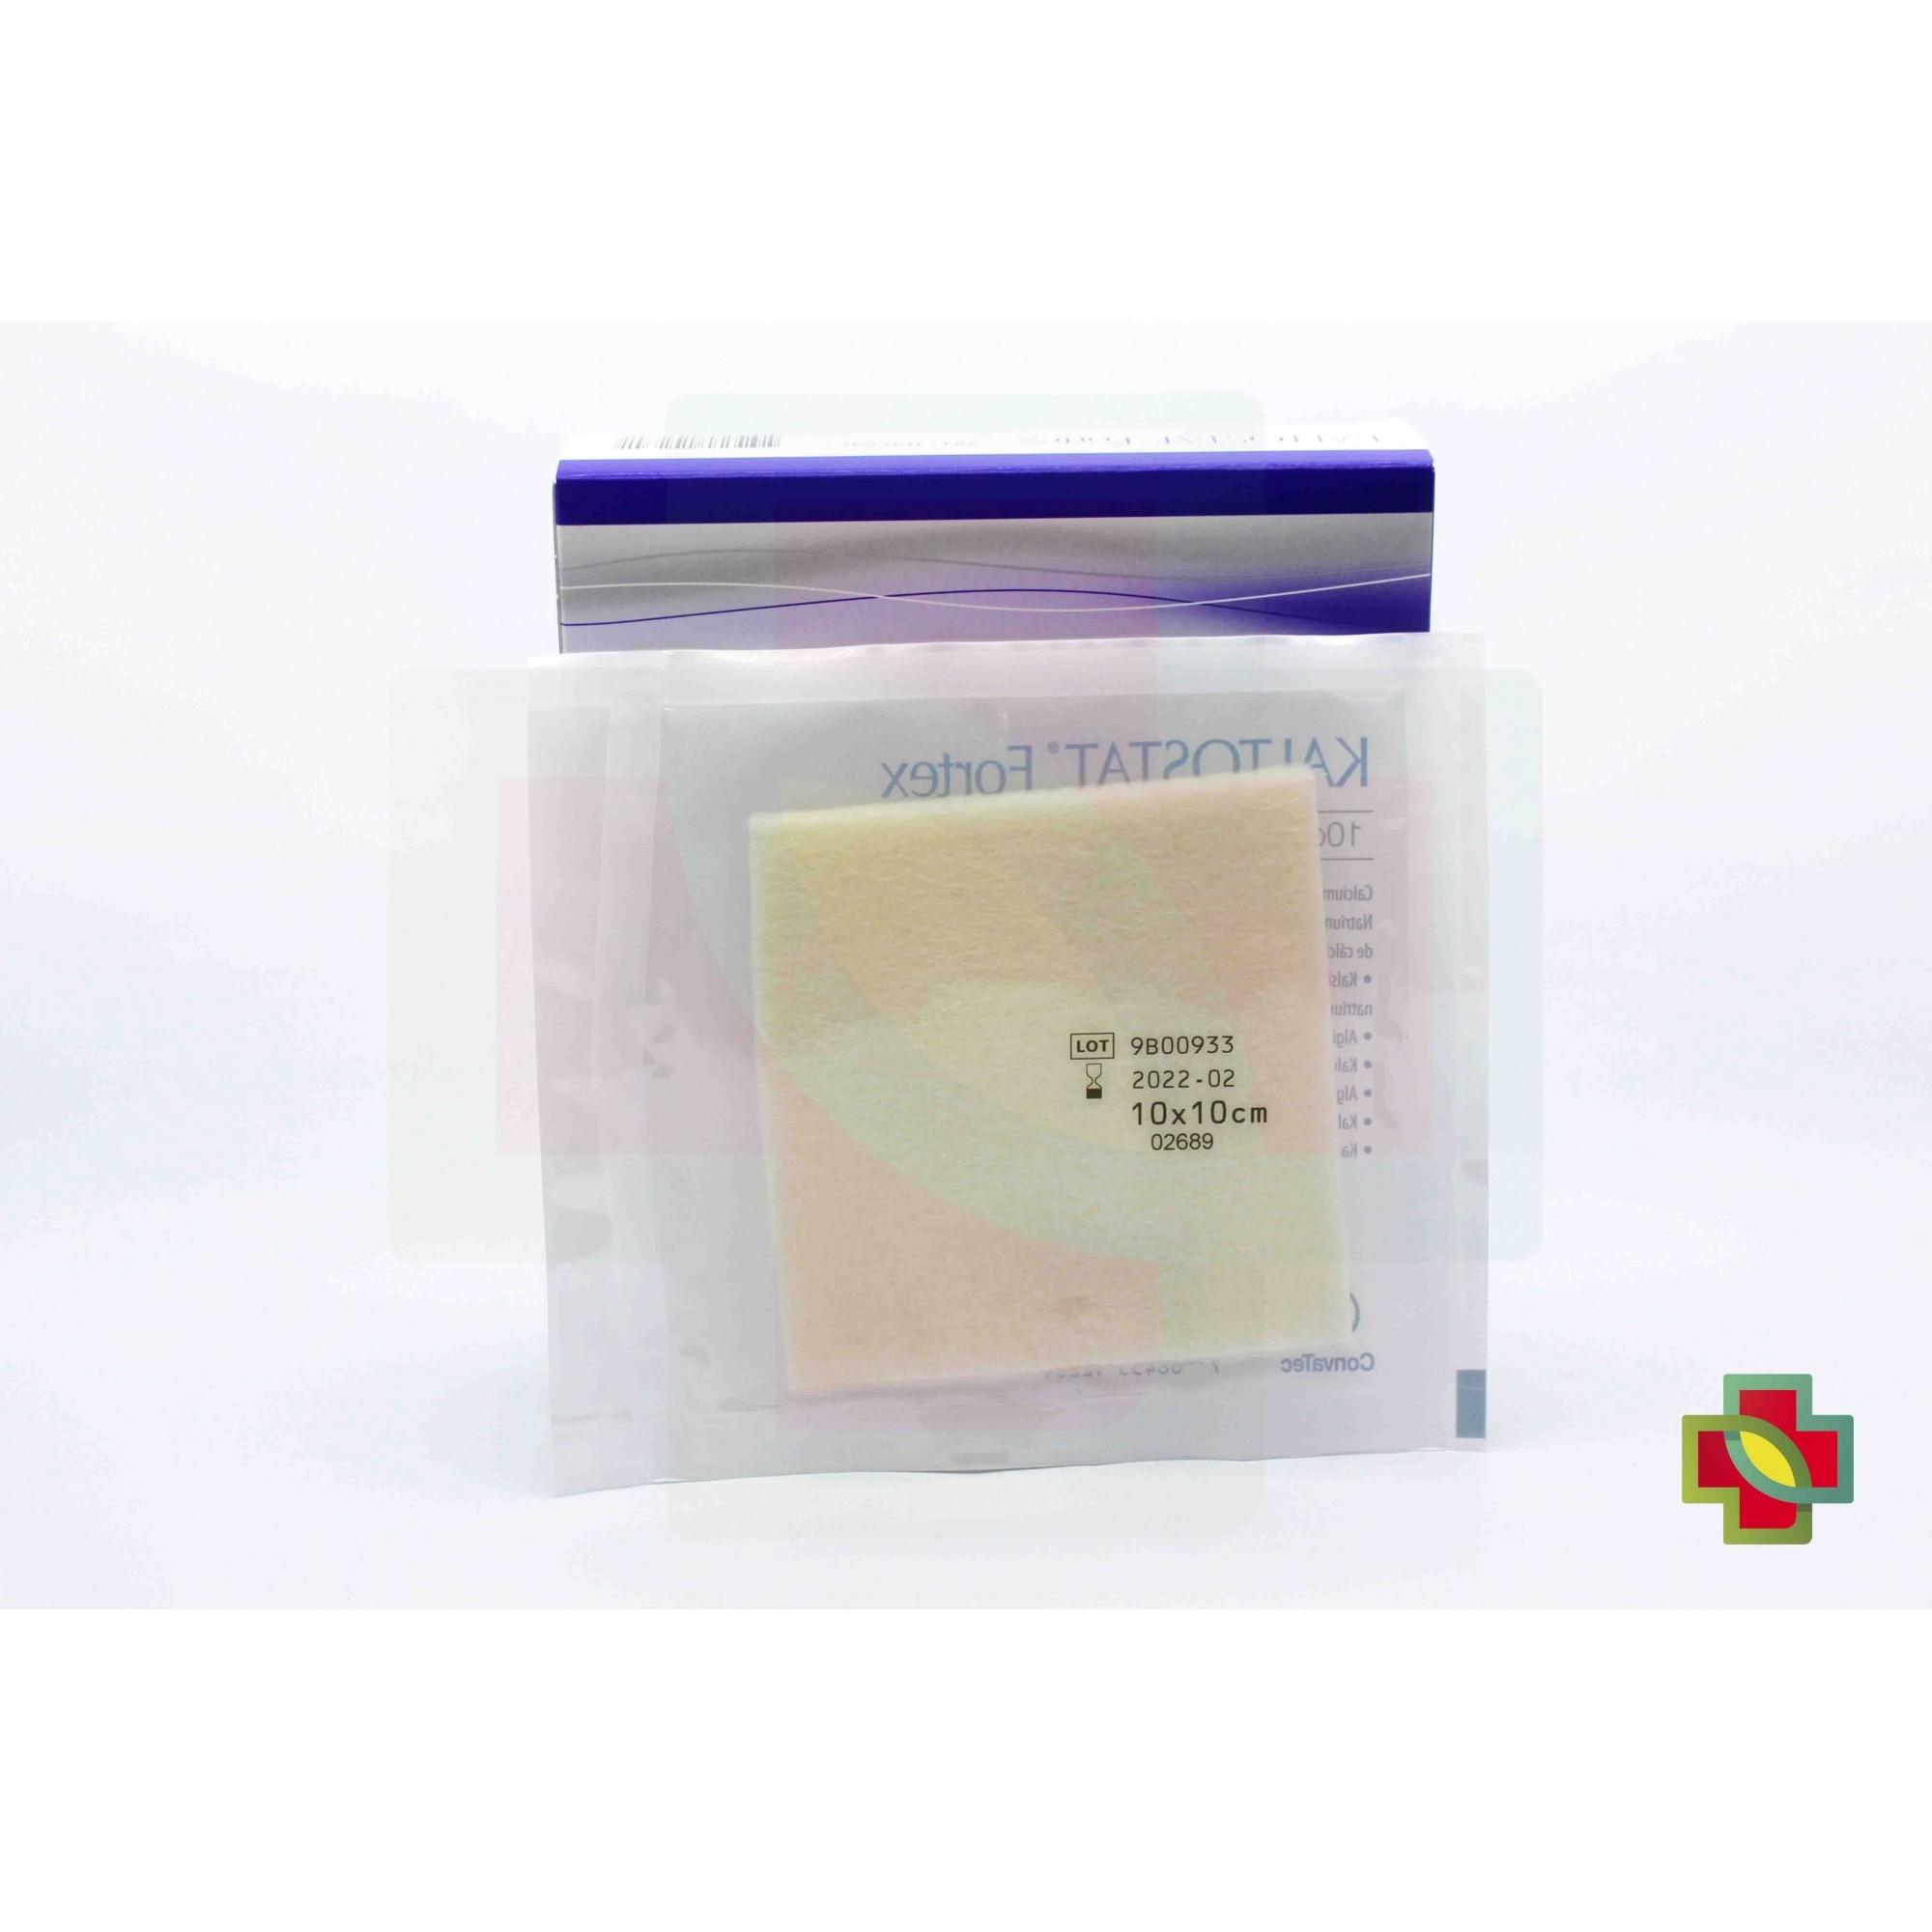 CURATIVO KALTOSTAT FORTEX 10 X 10 CM UND. 168356- CONVATEC